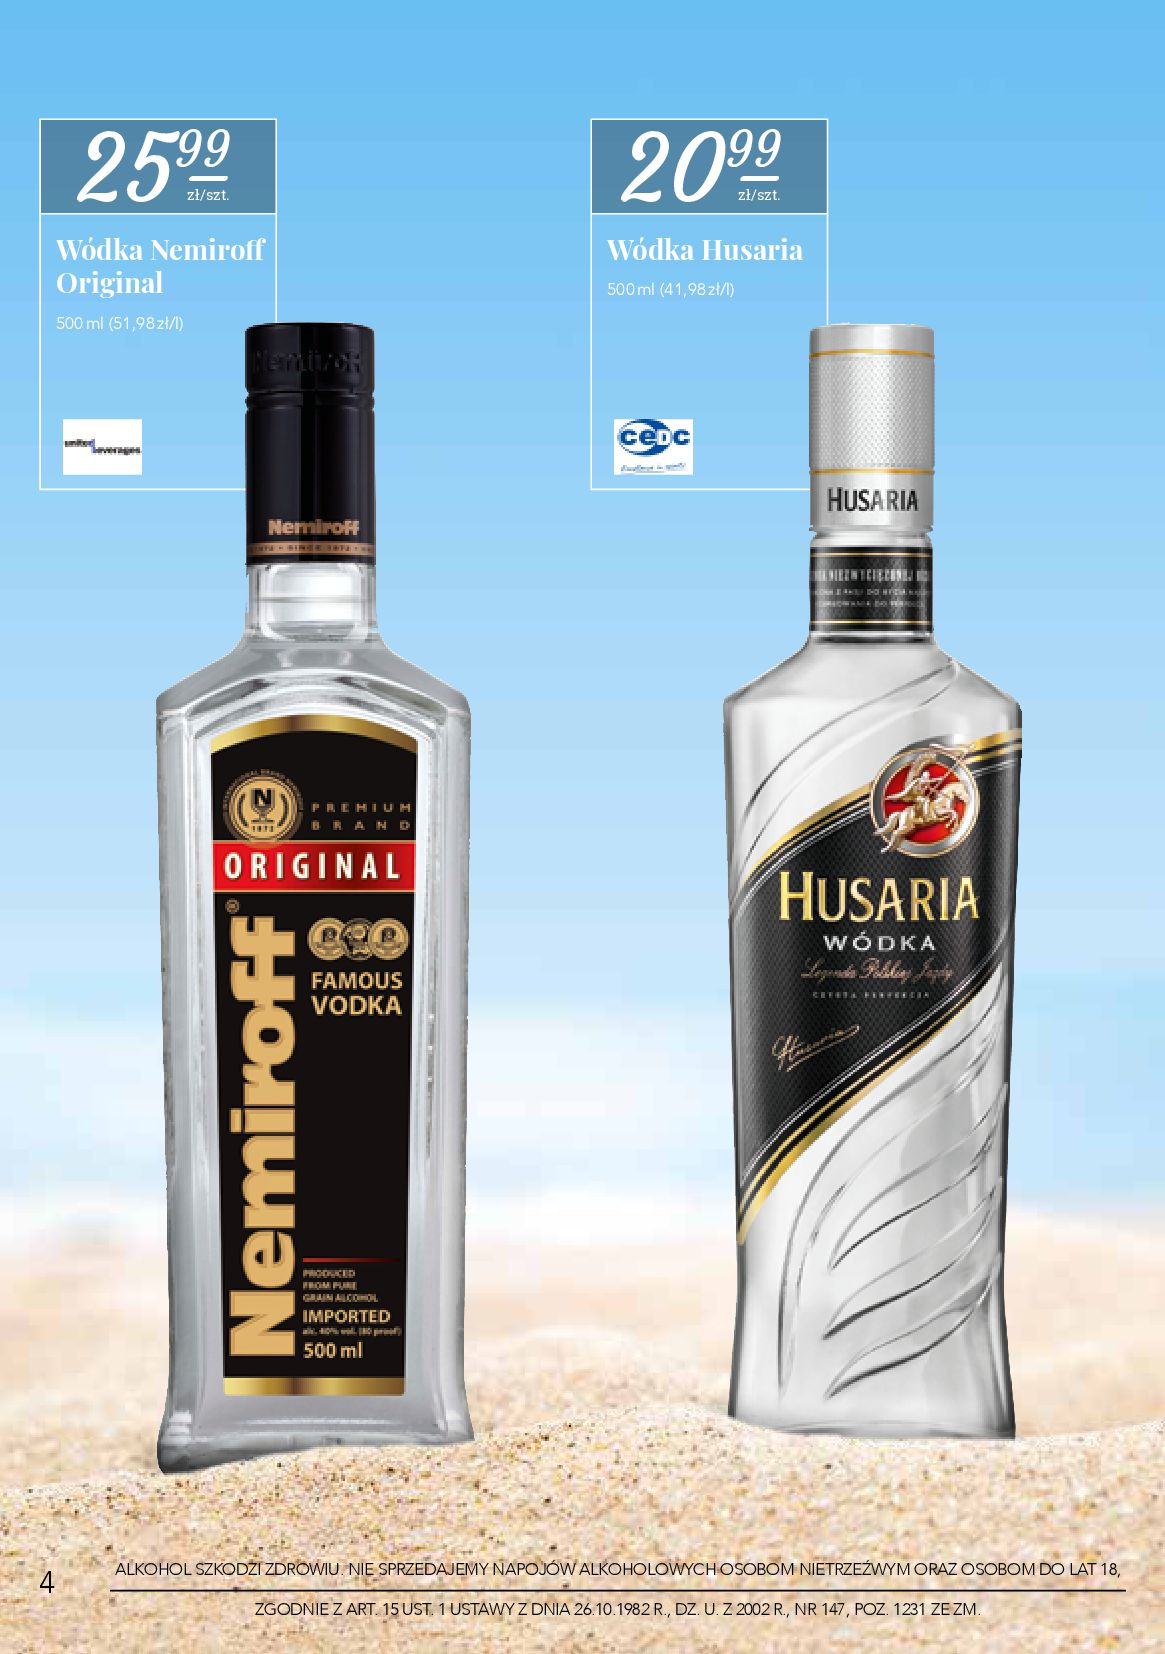 Gazetka Stokrotka Supermarket - Oferta alkoholowa-26.06.2019-17.07.2019-page-